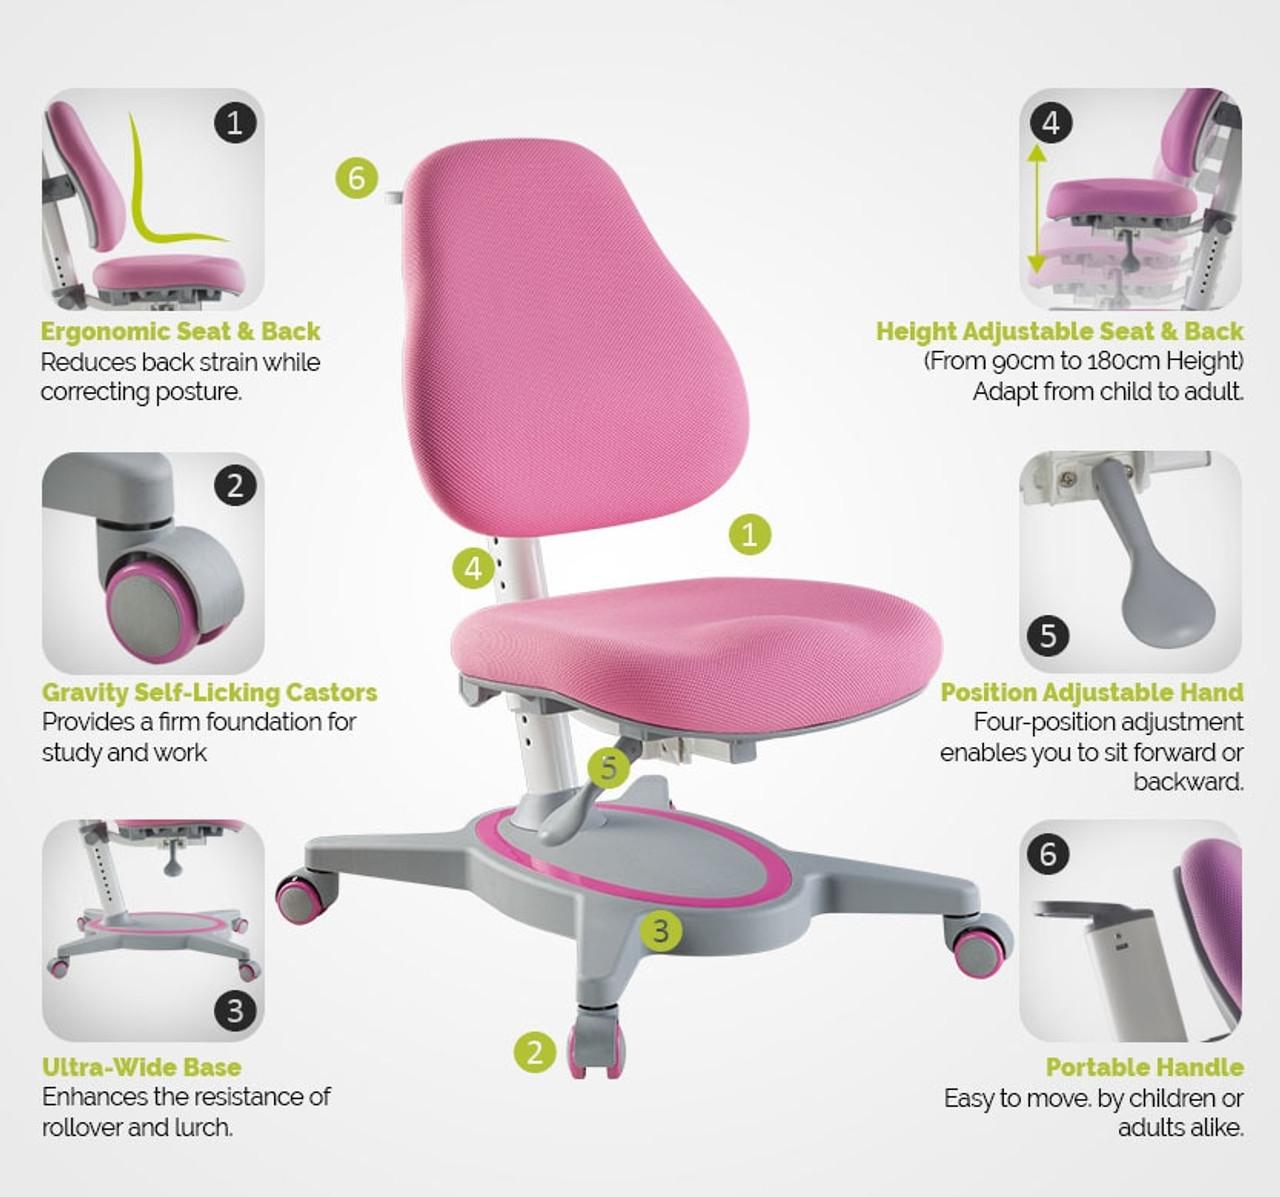 EFurnit Ergonomic Teen Desk Chair, Height Adjustable Desk Chair- Full-Backrest Series , pink, blue